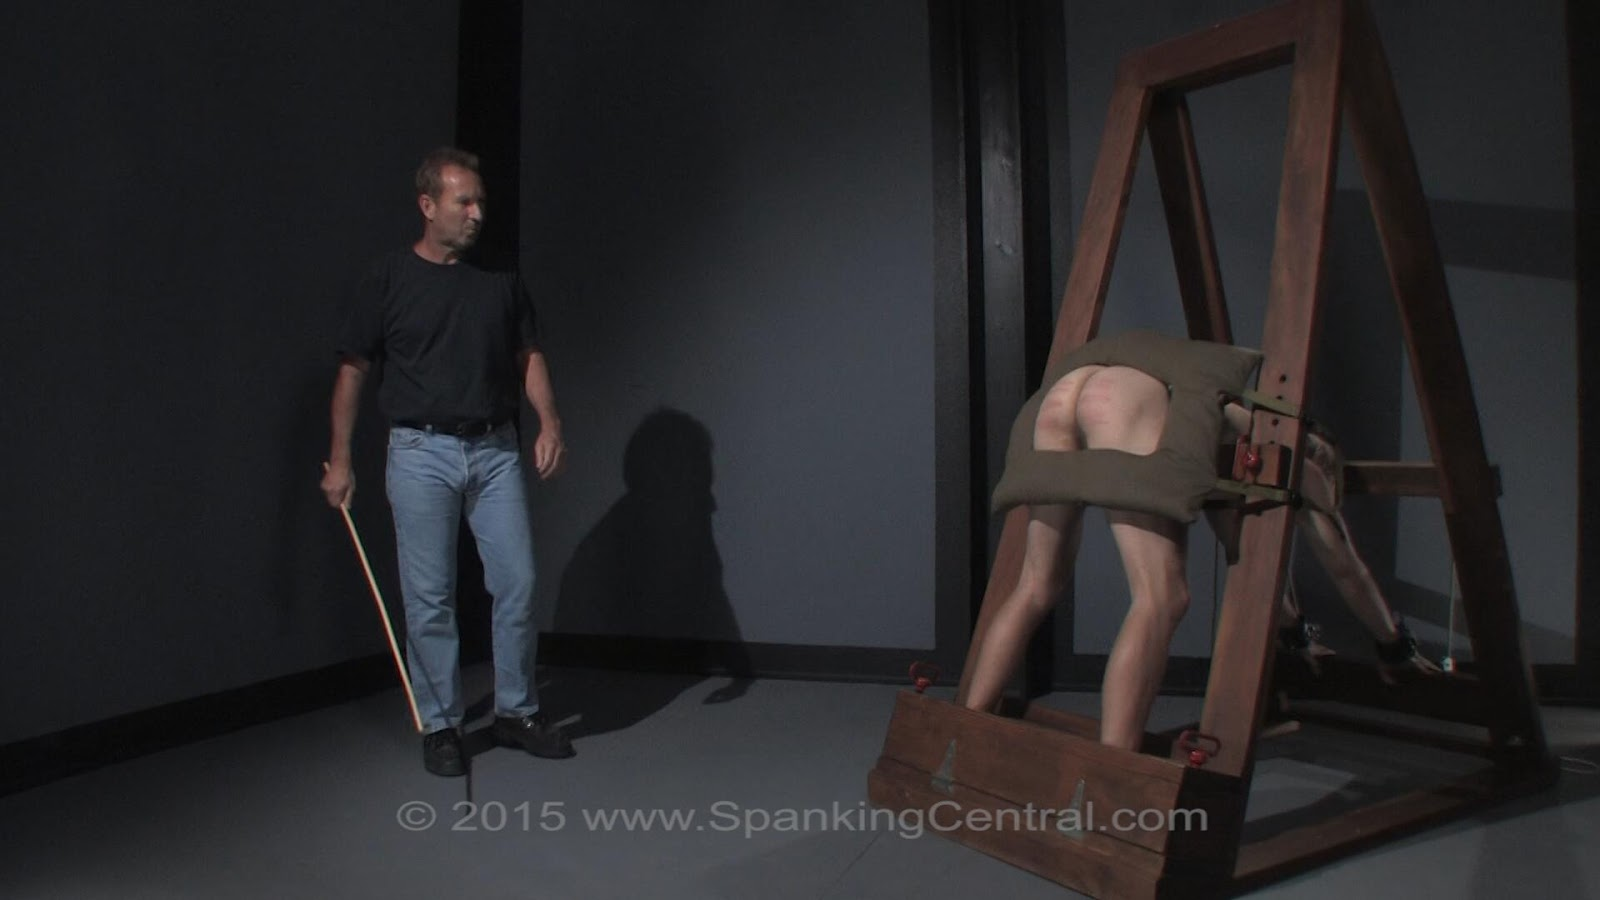 Twink paddling gay porn i got hard really